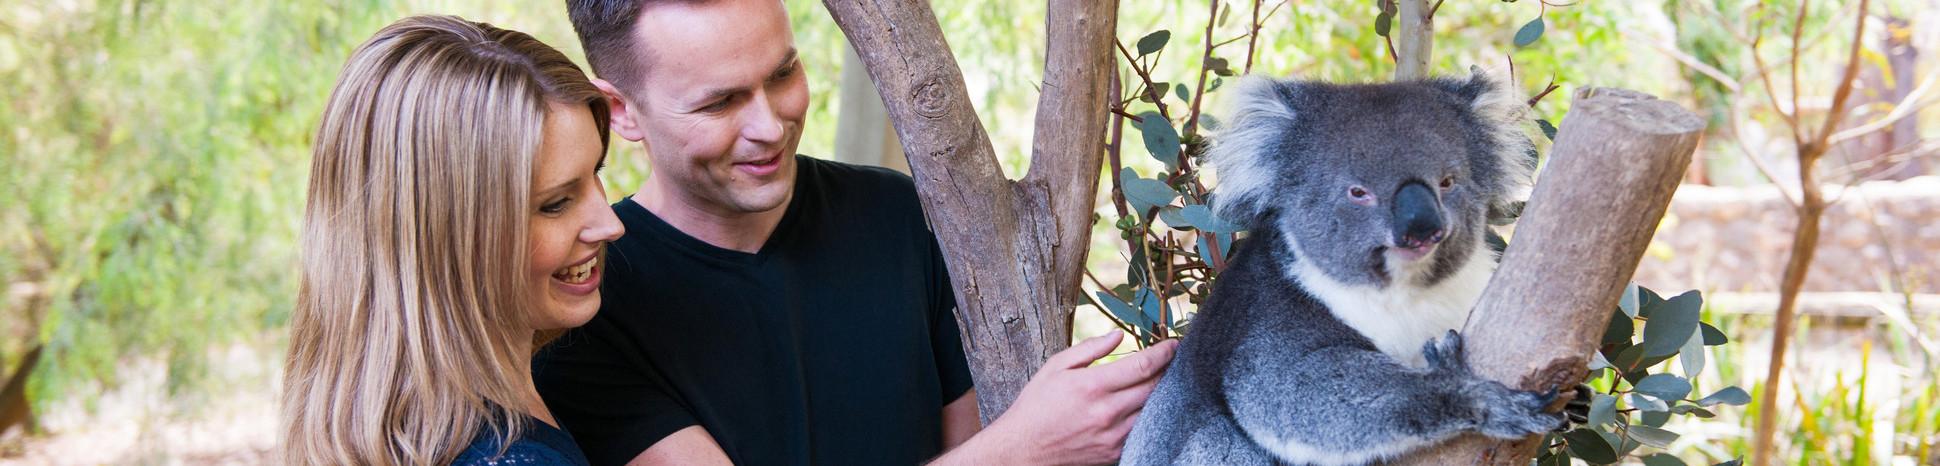 Koala at Cleland Wildlife Park, Crafers, Adelaide Hills